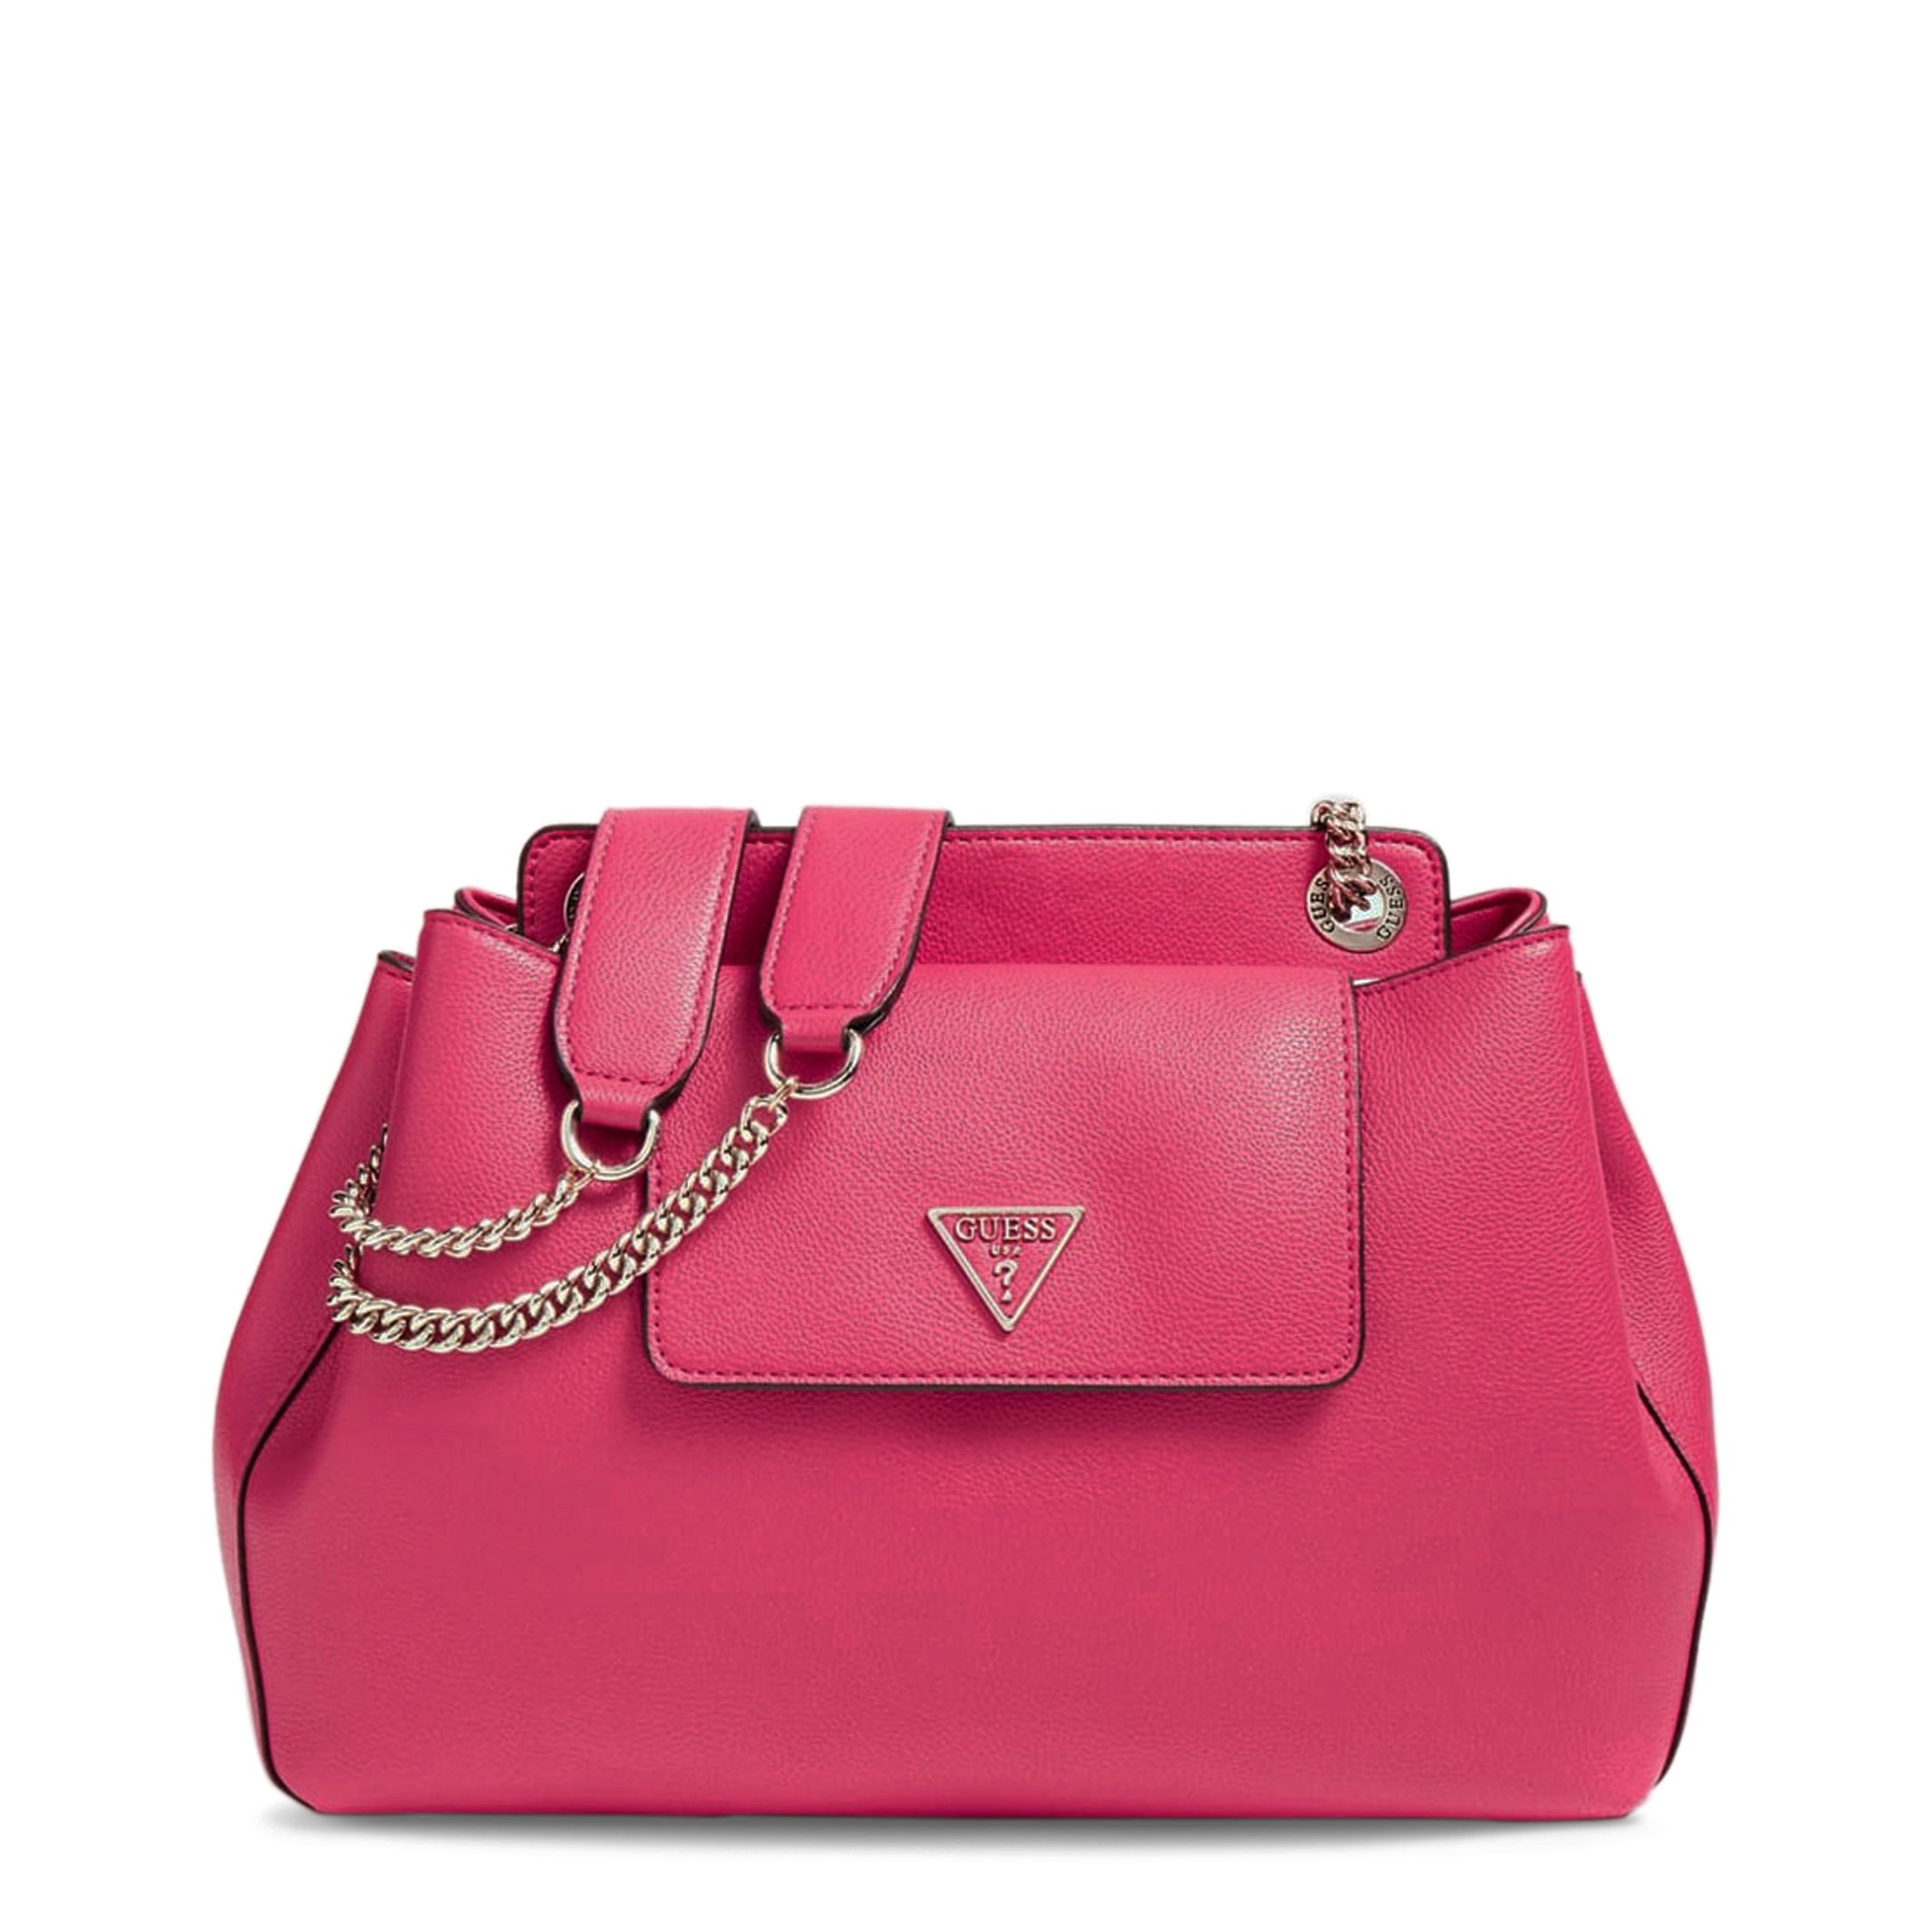 Guess Women's Shoulder Bag Various Colours Sandrine_HWVG79_65090 - pink NOSIZE